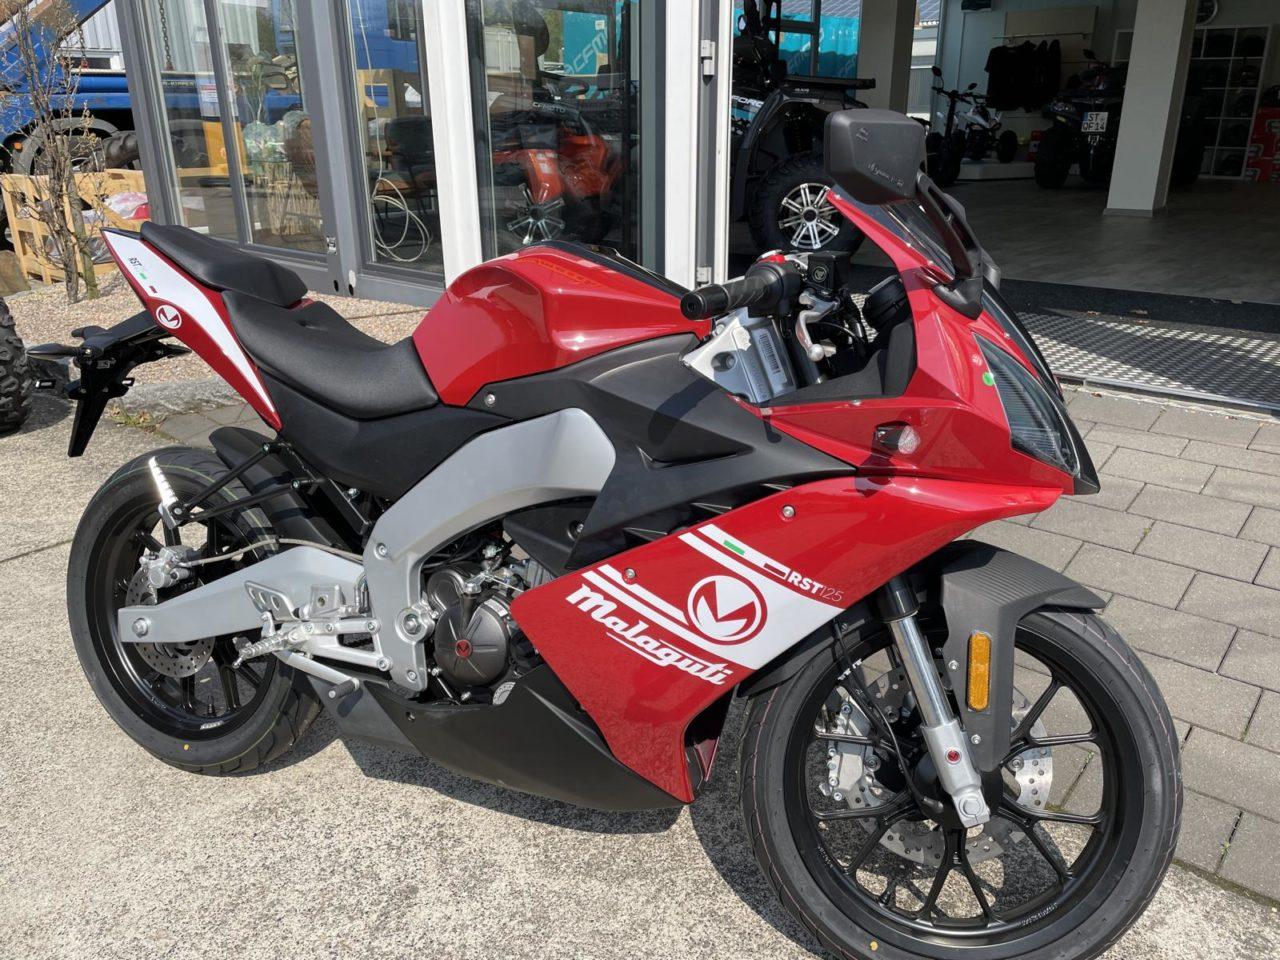 Motorrad Malaguti RST 125, volle Leistung , CBS, Supersportler !